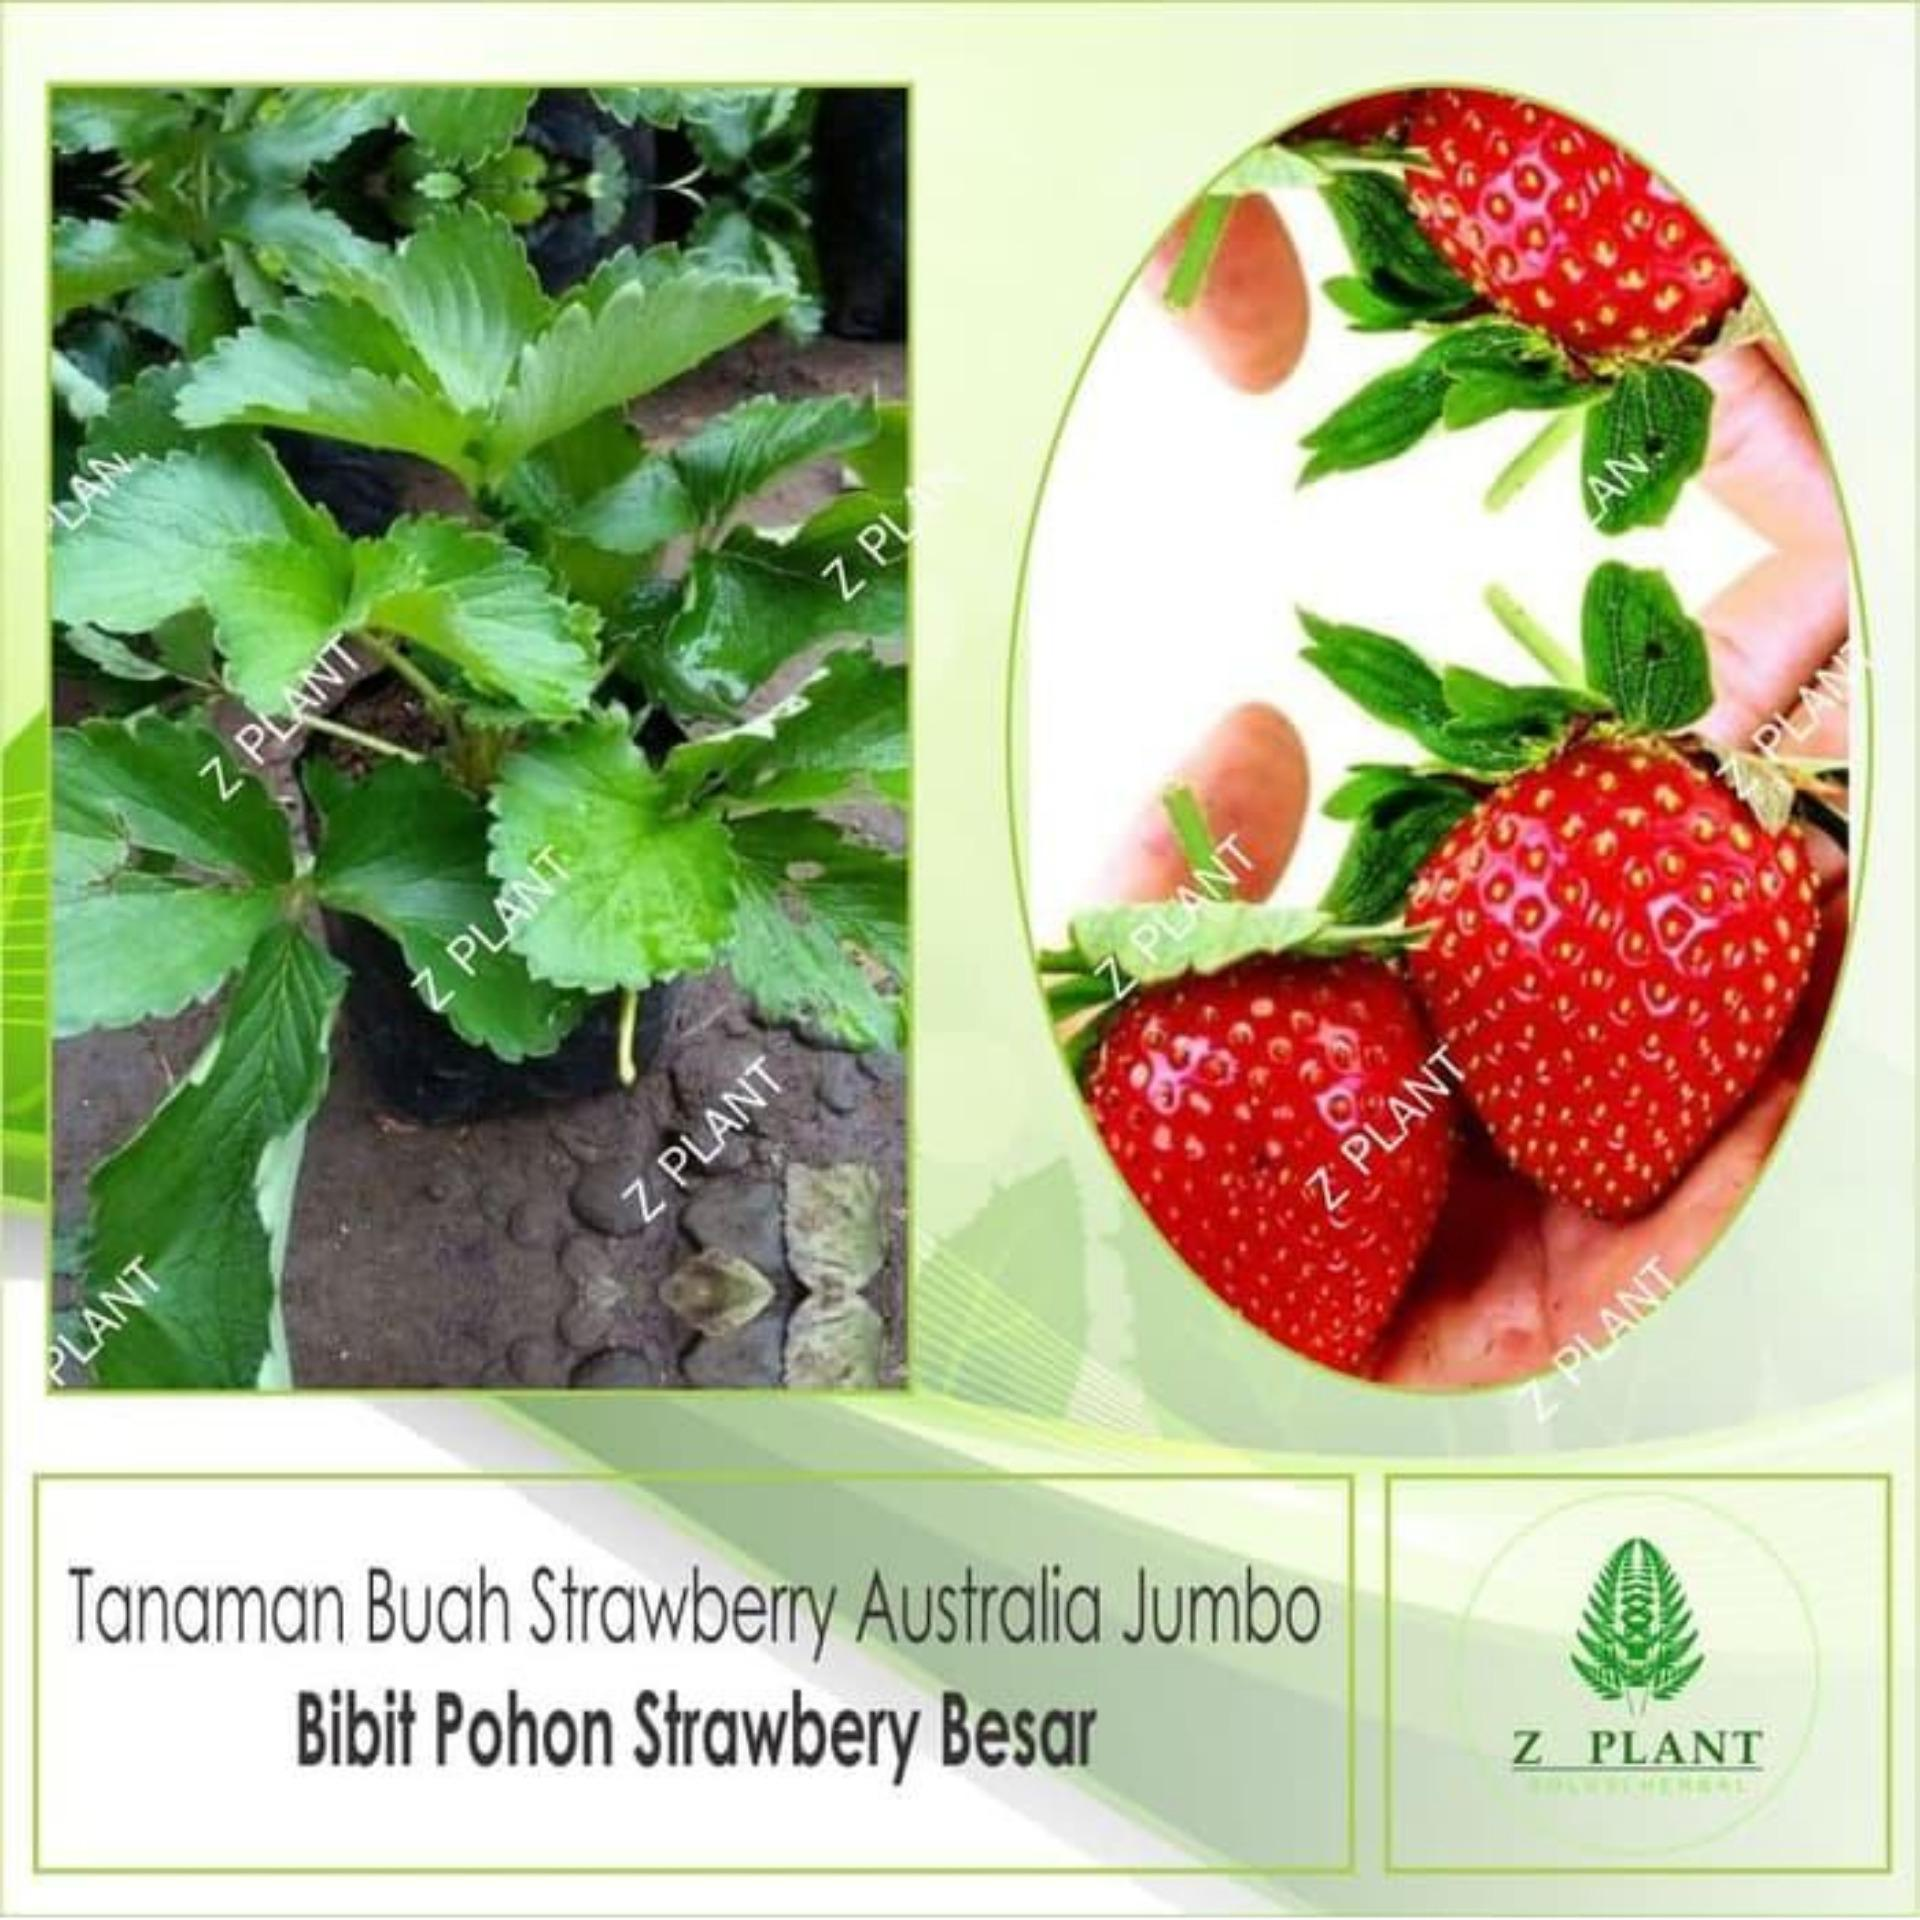 bibit pohon strawberry Australia /jumbo